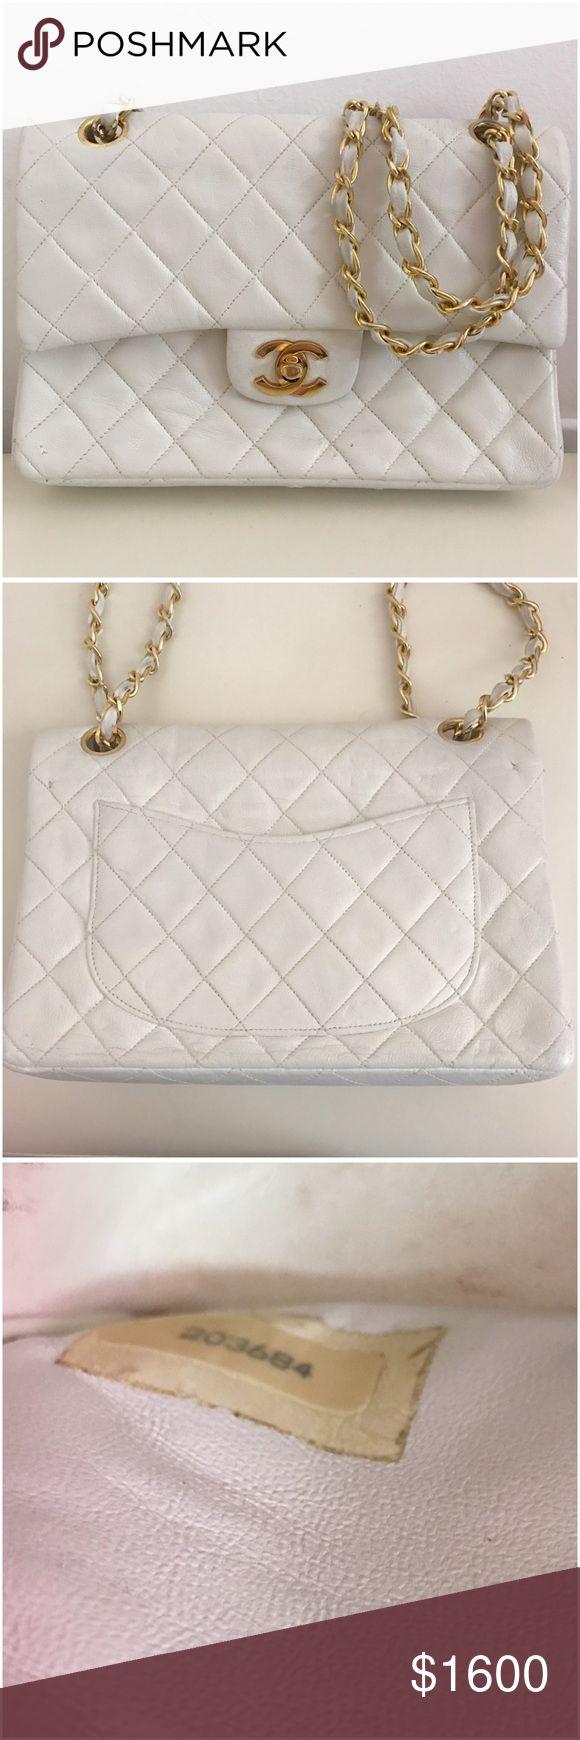 Chanel handbag superb vintage chanel bag vintage leather - Authentic Chanel Double Flap Beige Vintage